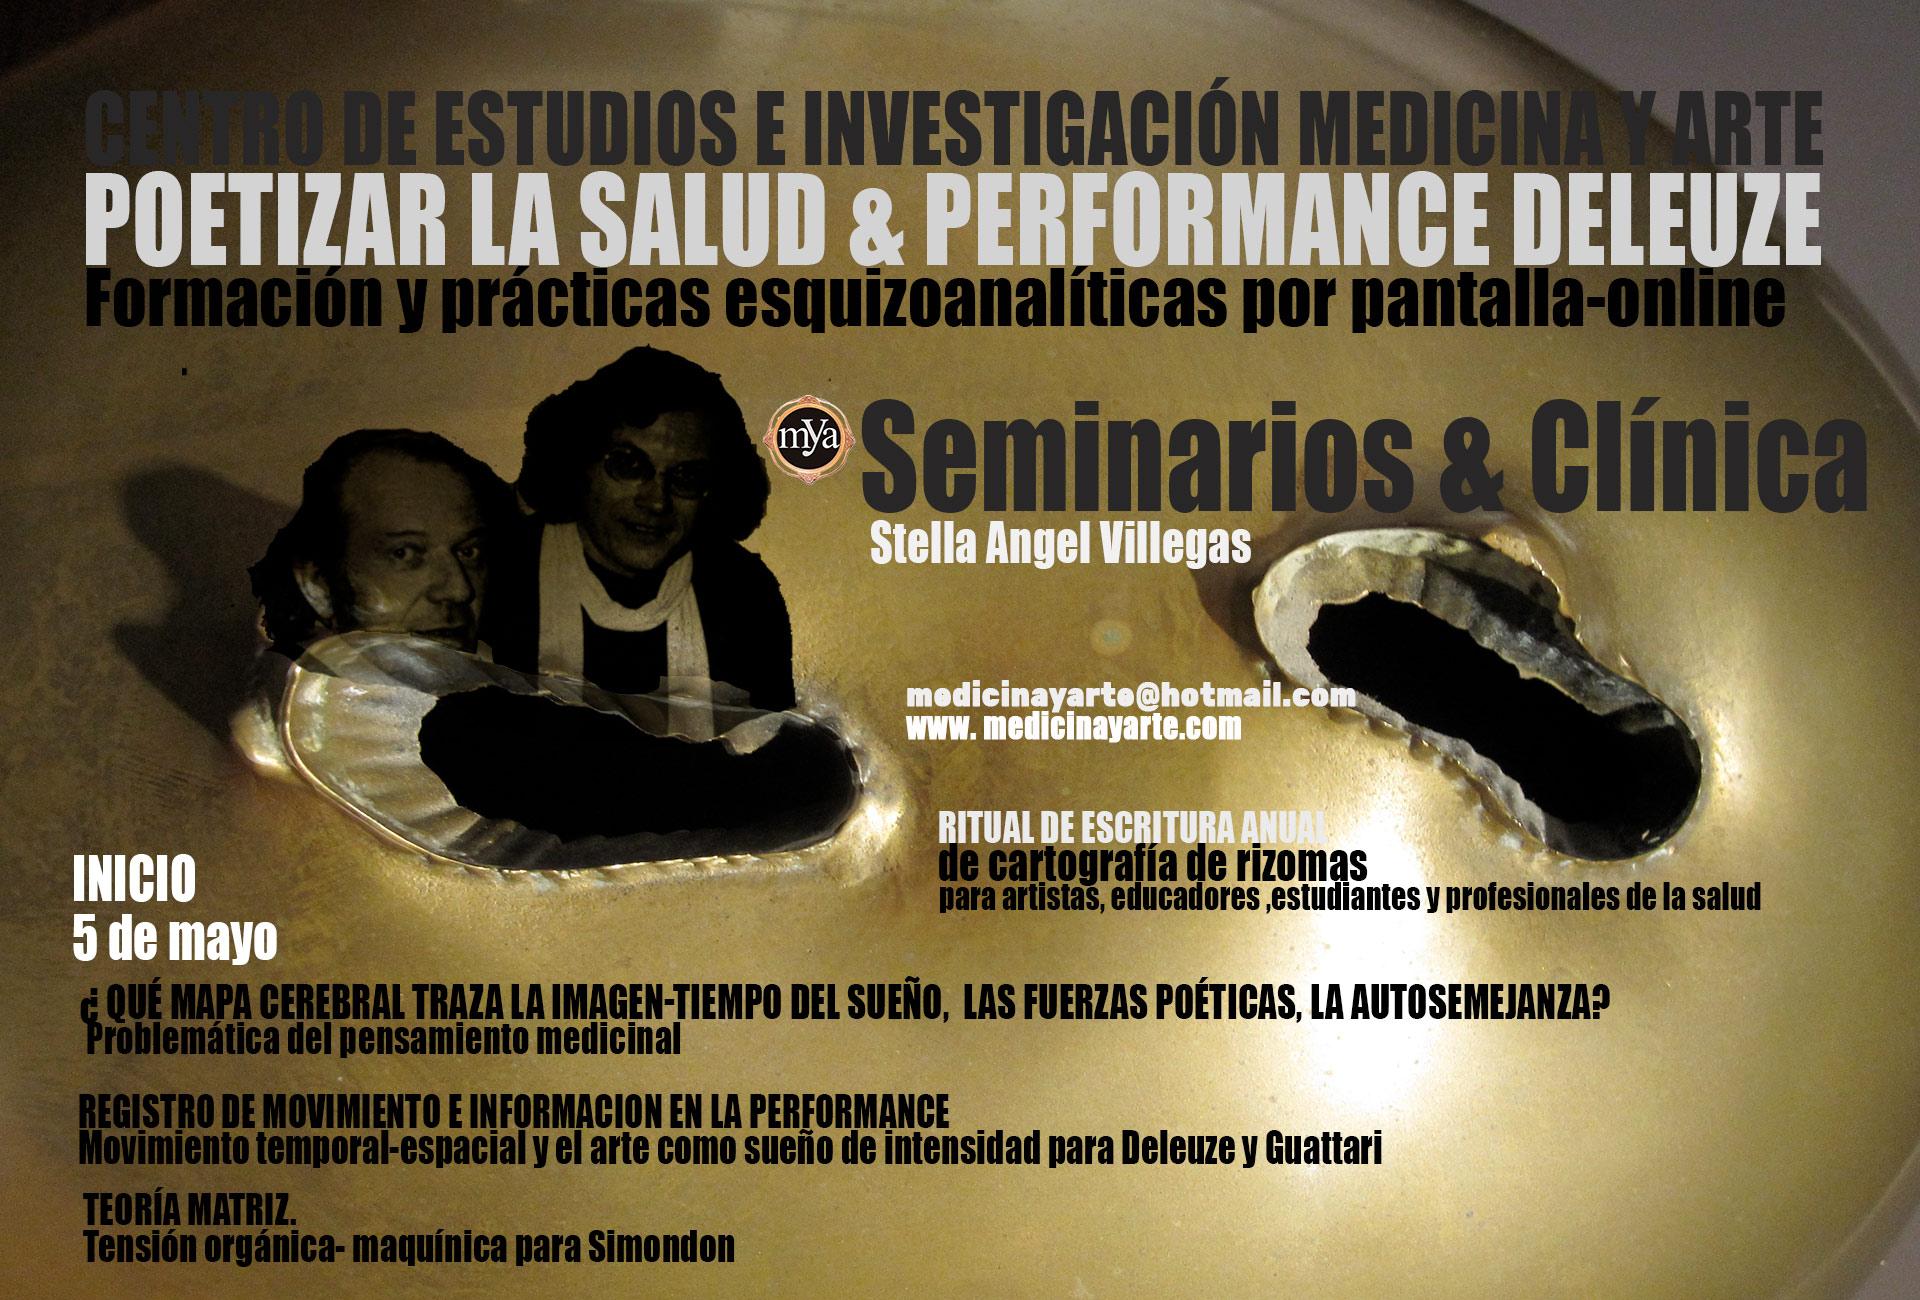 http://www.medicinayarte.com/img/poetizar_la_Salud_Performance_Deleuzev2.jpg